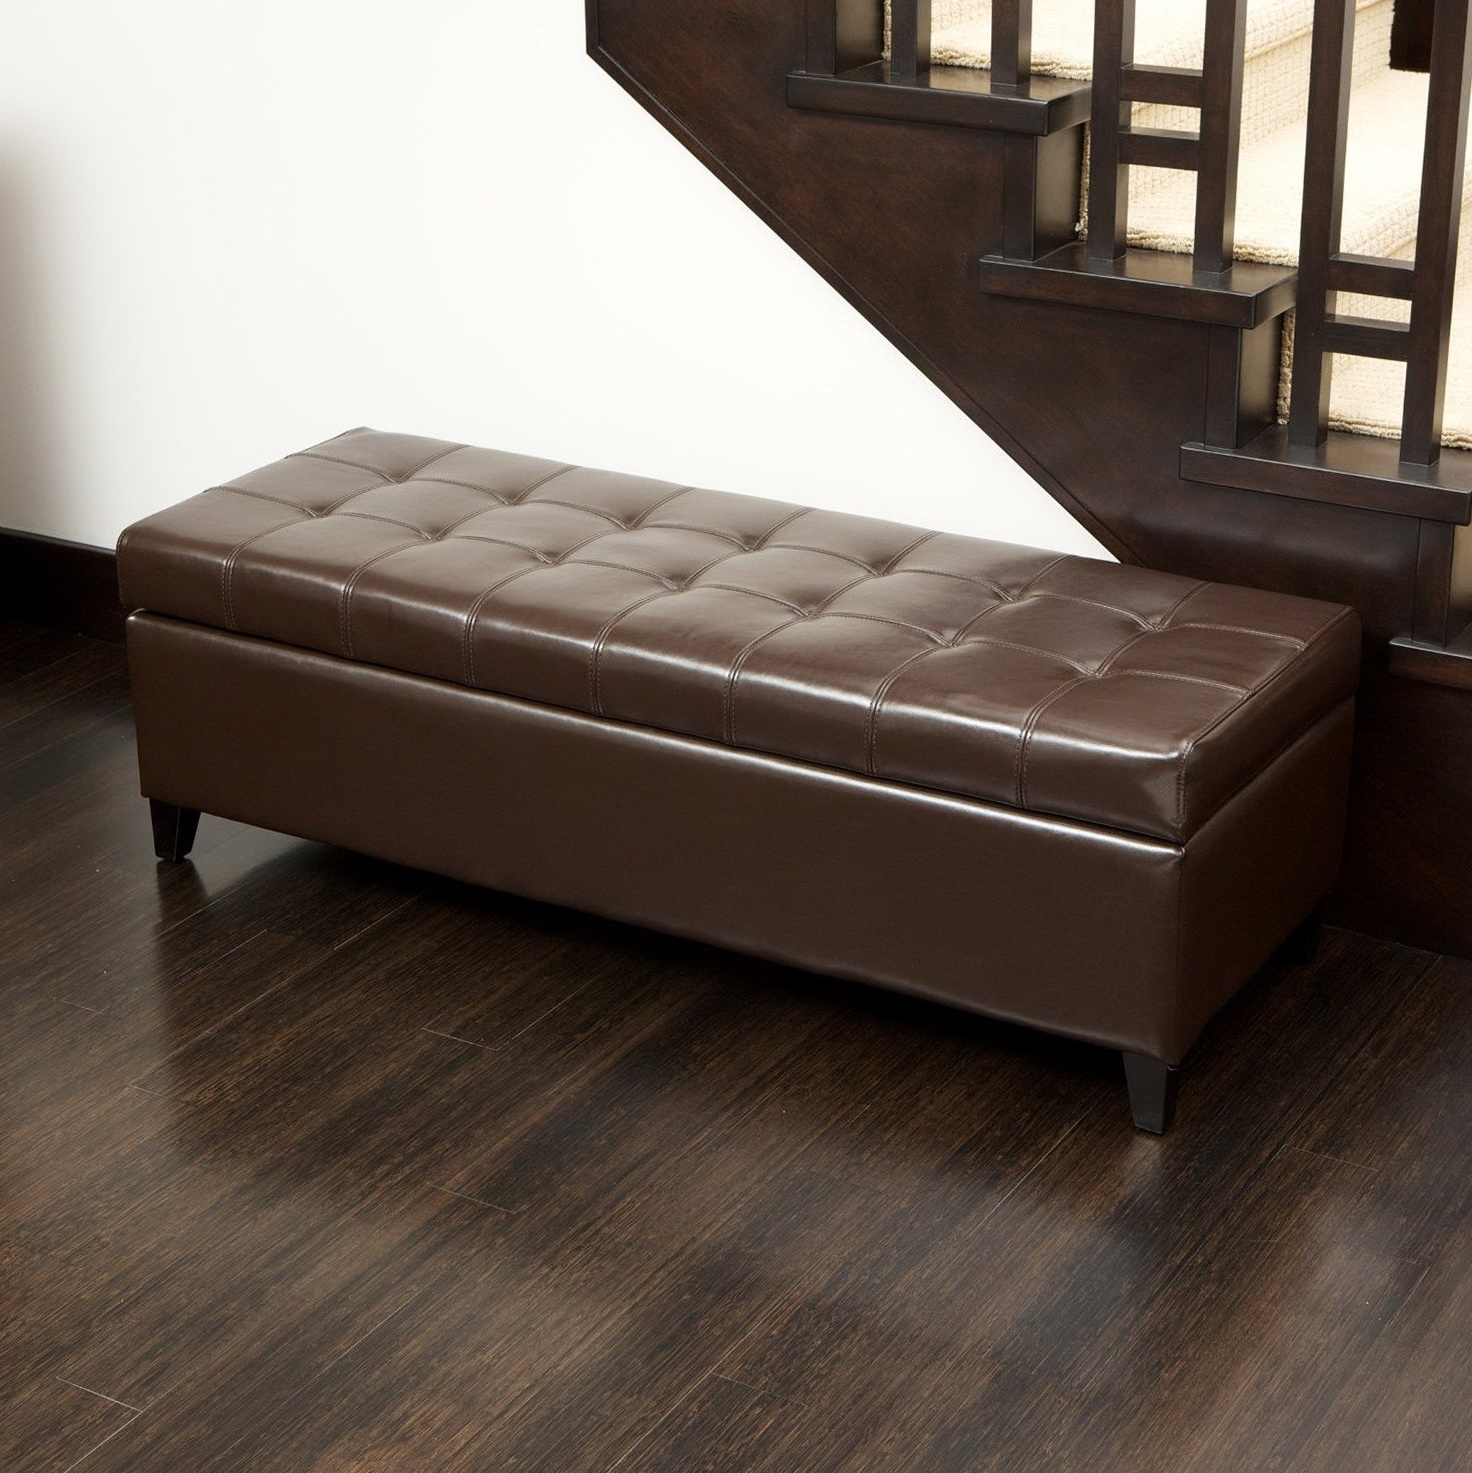 Large Storage Ottoman Bench Home Design Ideas